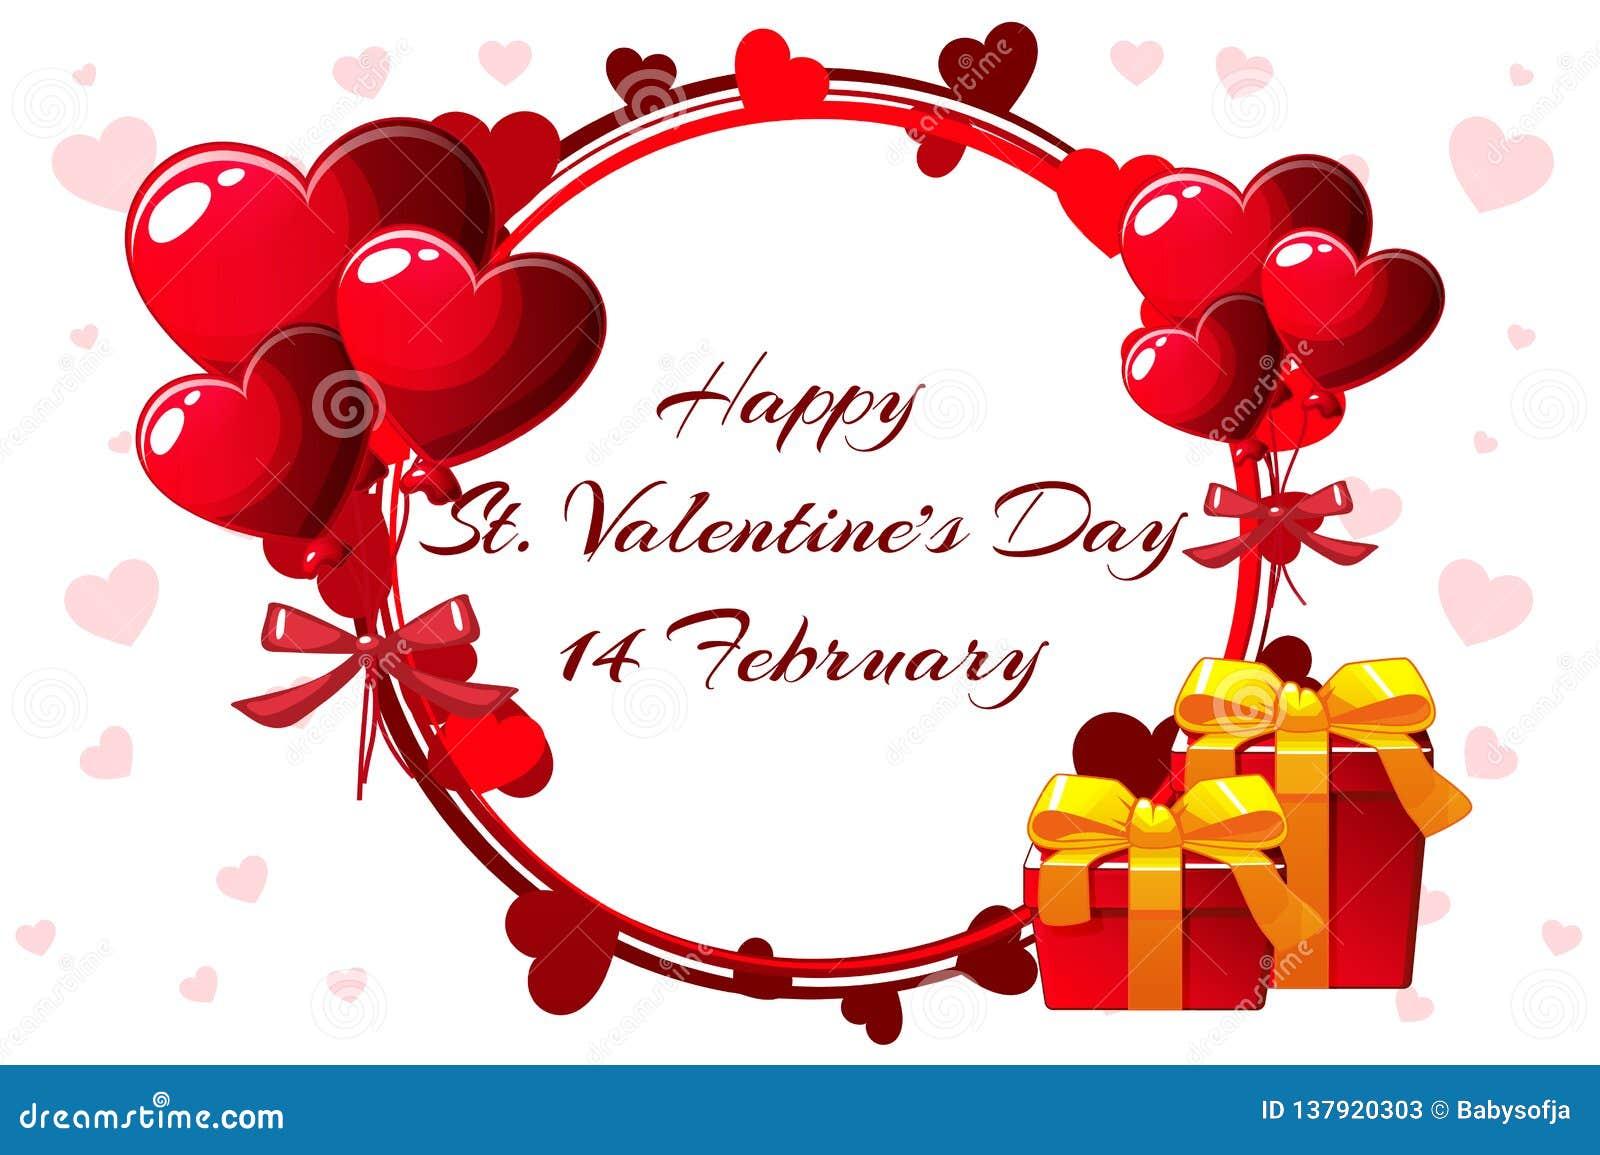 Romantic Wreath For Saint Valentine Day Wedding Invitations Hen